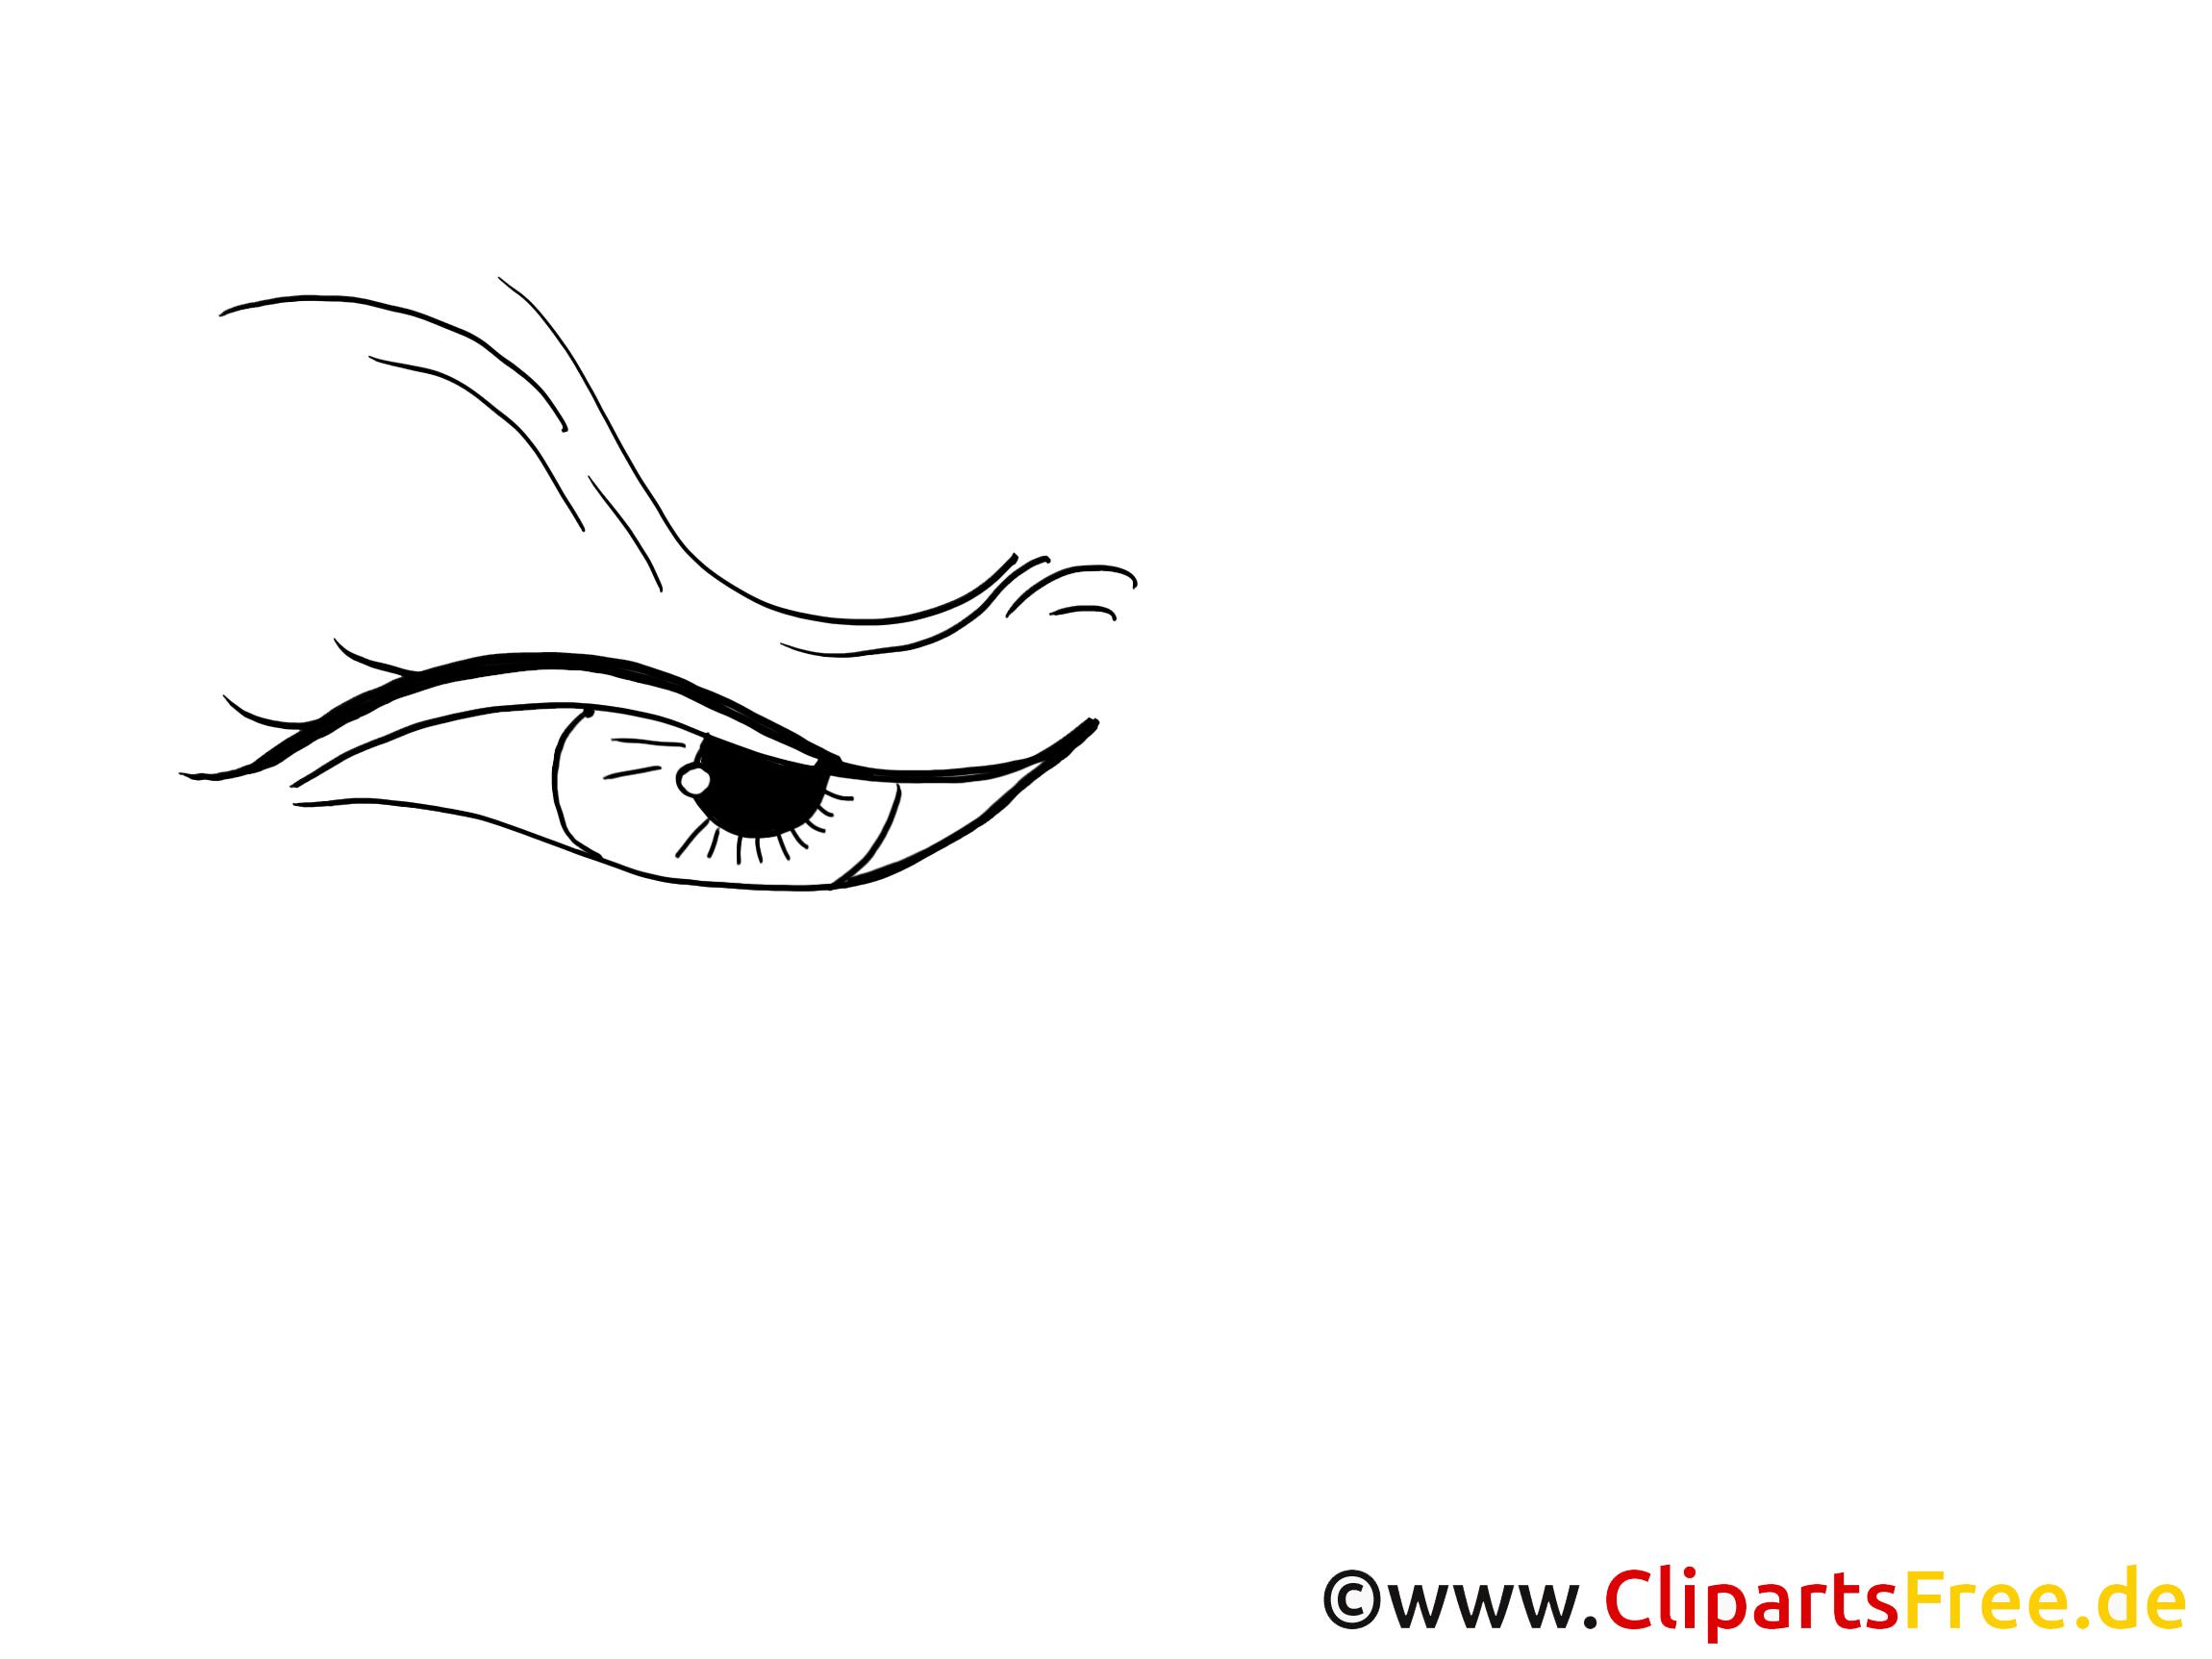 Strenger Blick Clipart, Bild, Zeichnung, Grafik